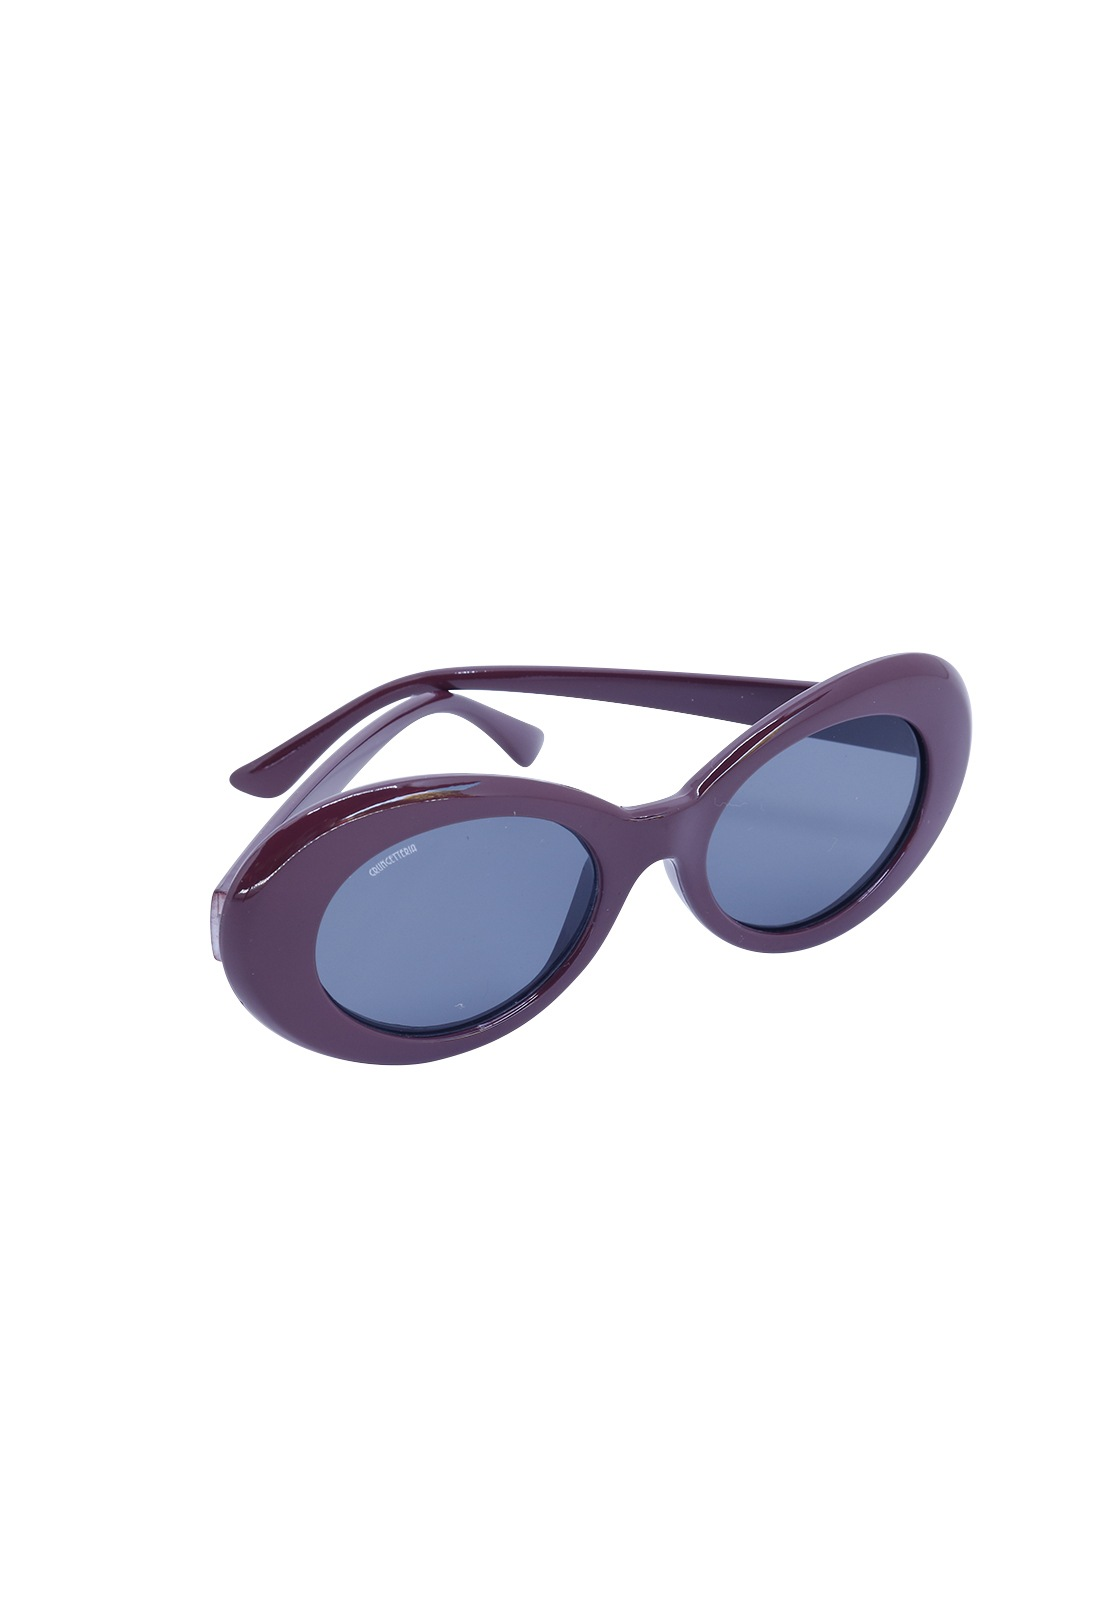 Óculos de Sol Grungetteria Kurt Betteraba